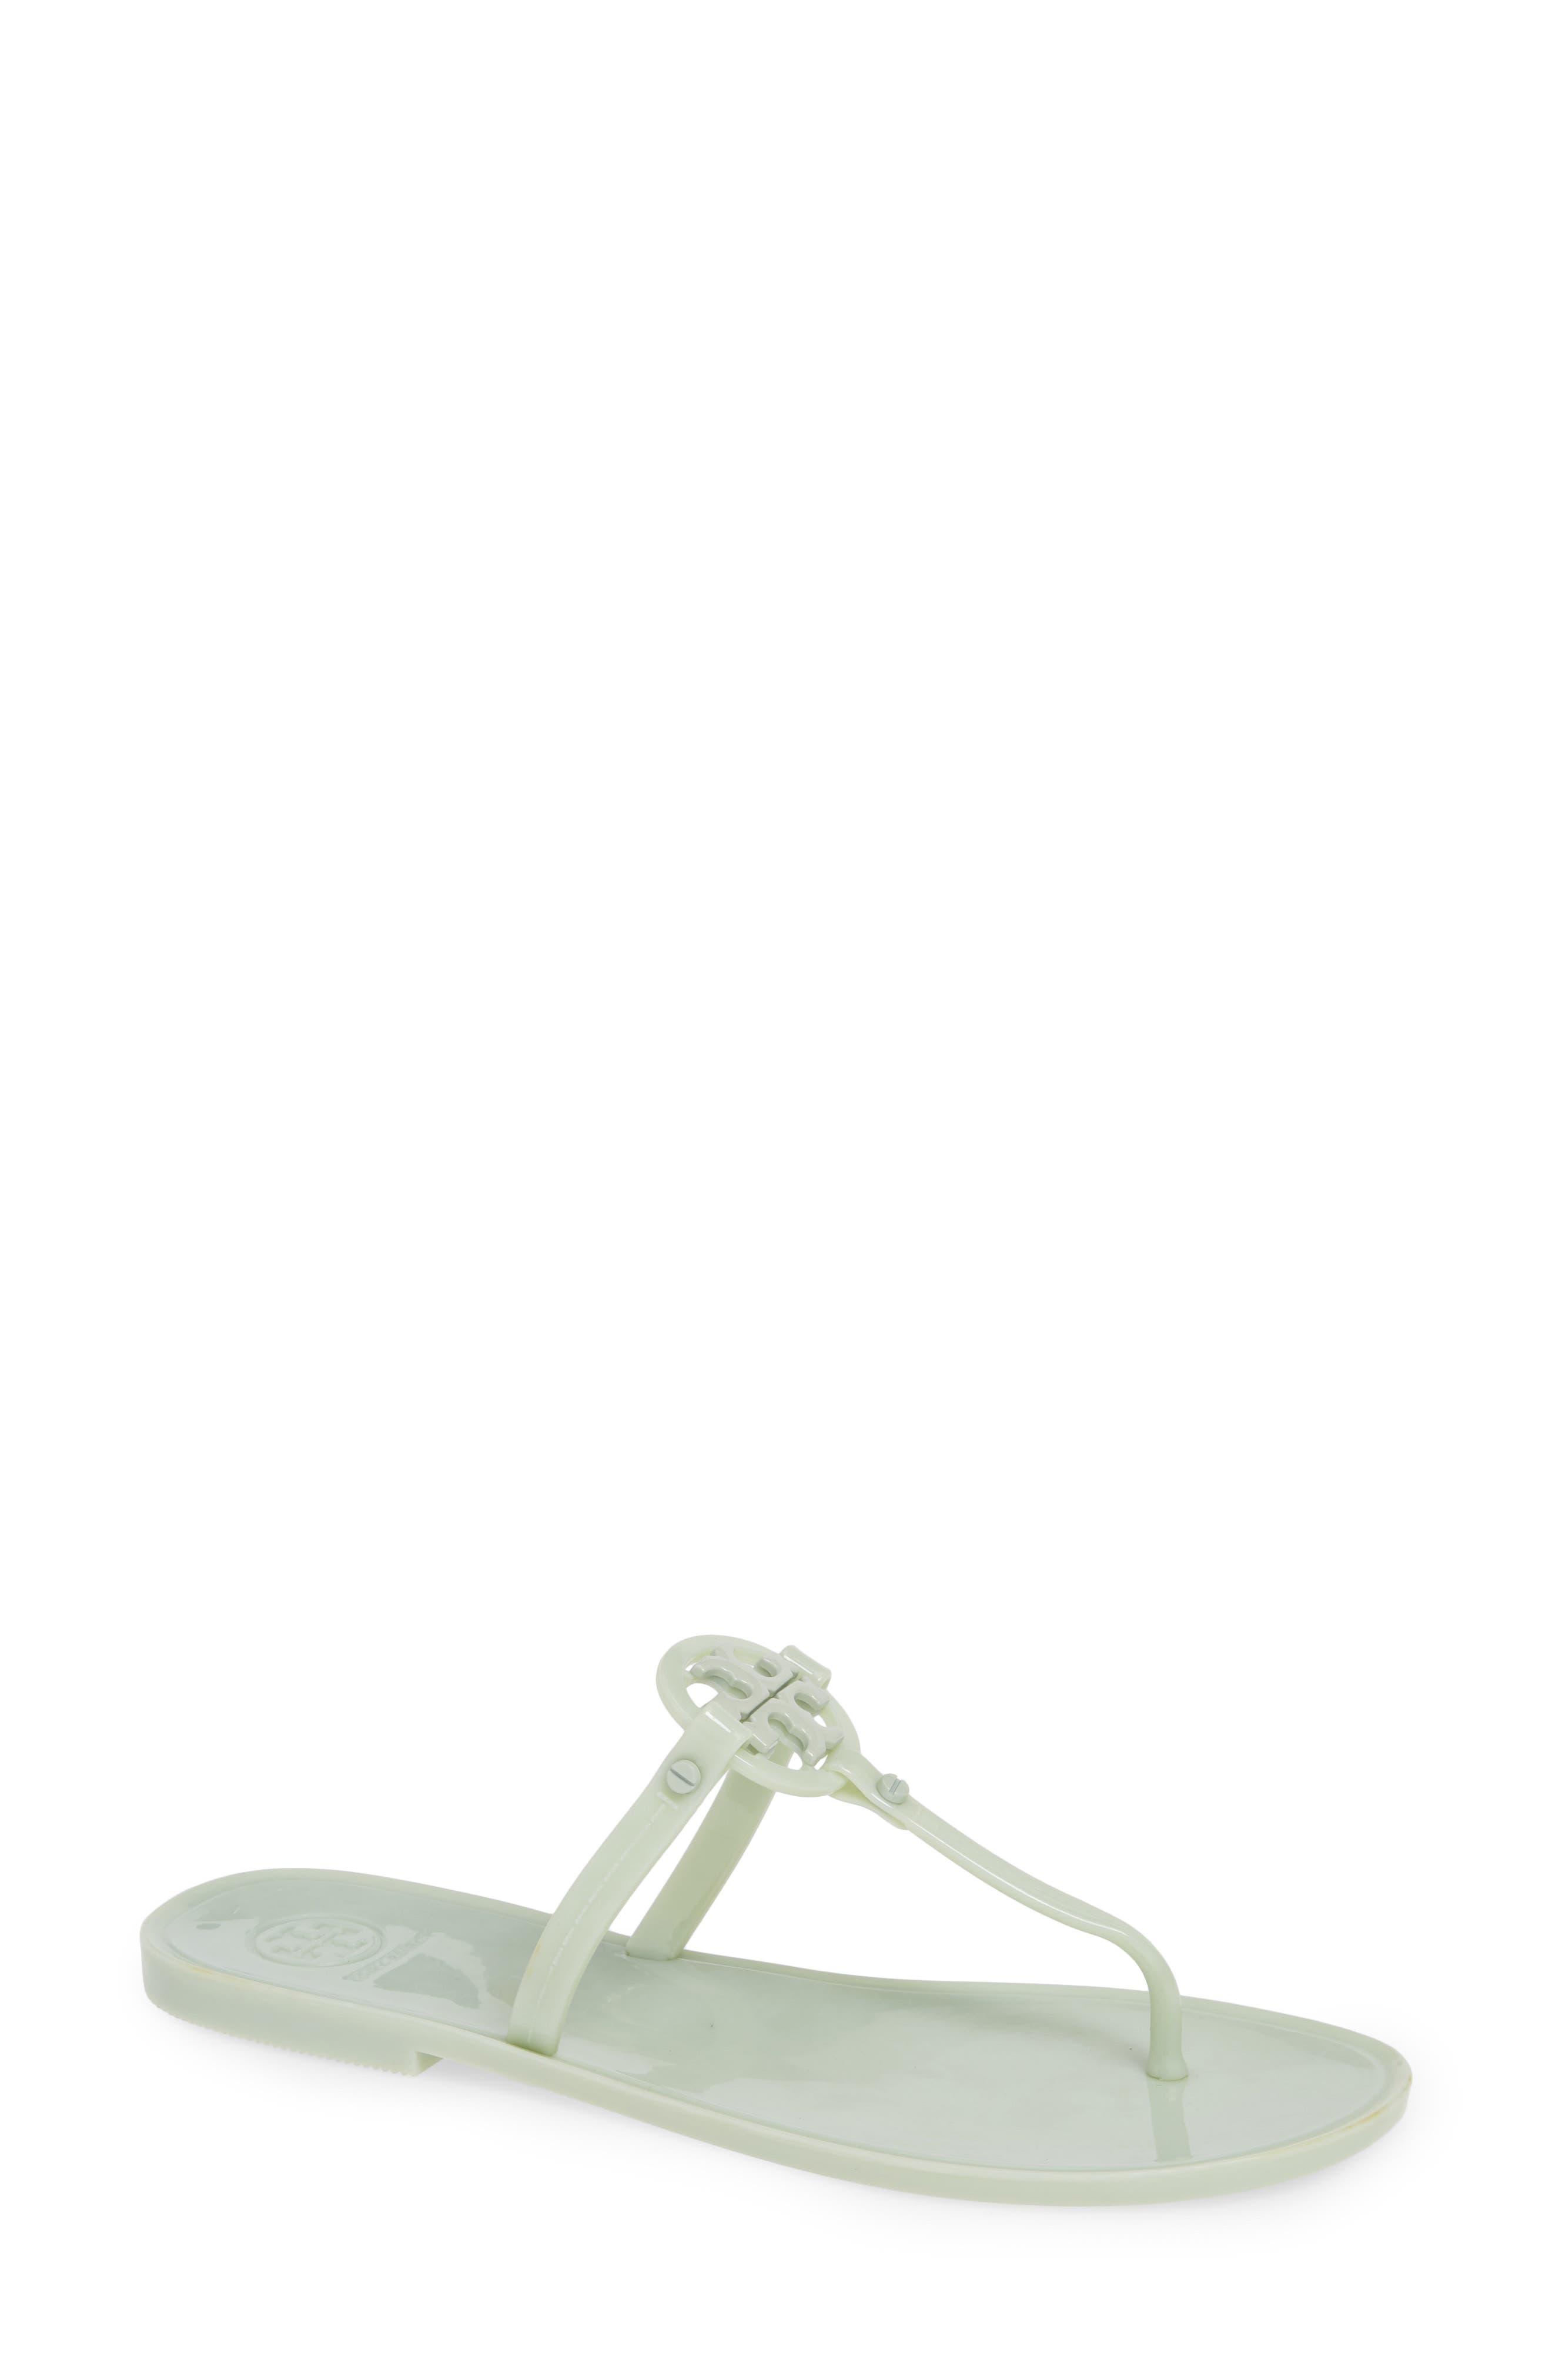 d2163430b632 Women s Off-White Sandals